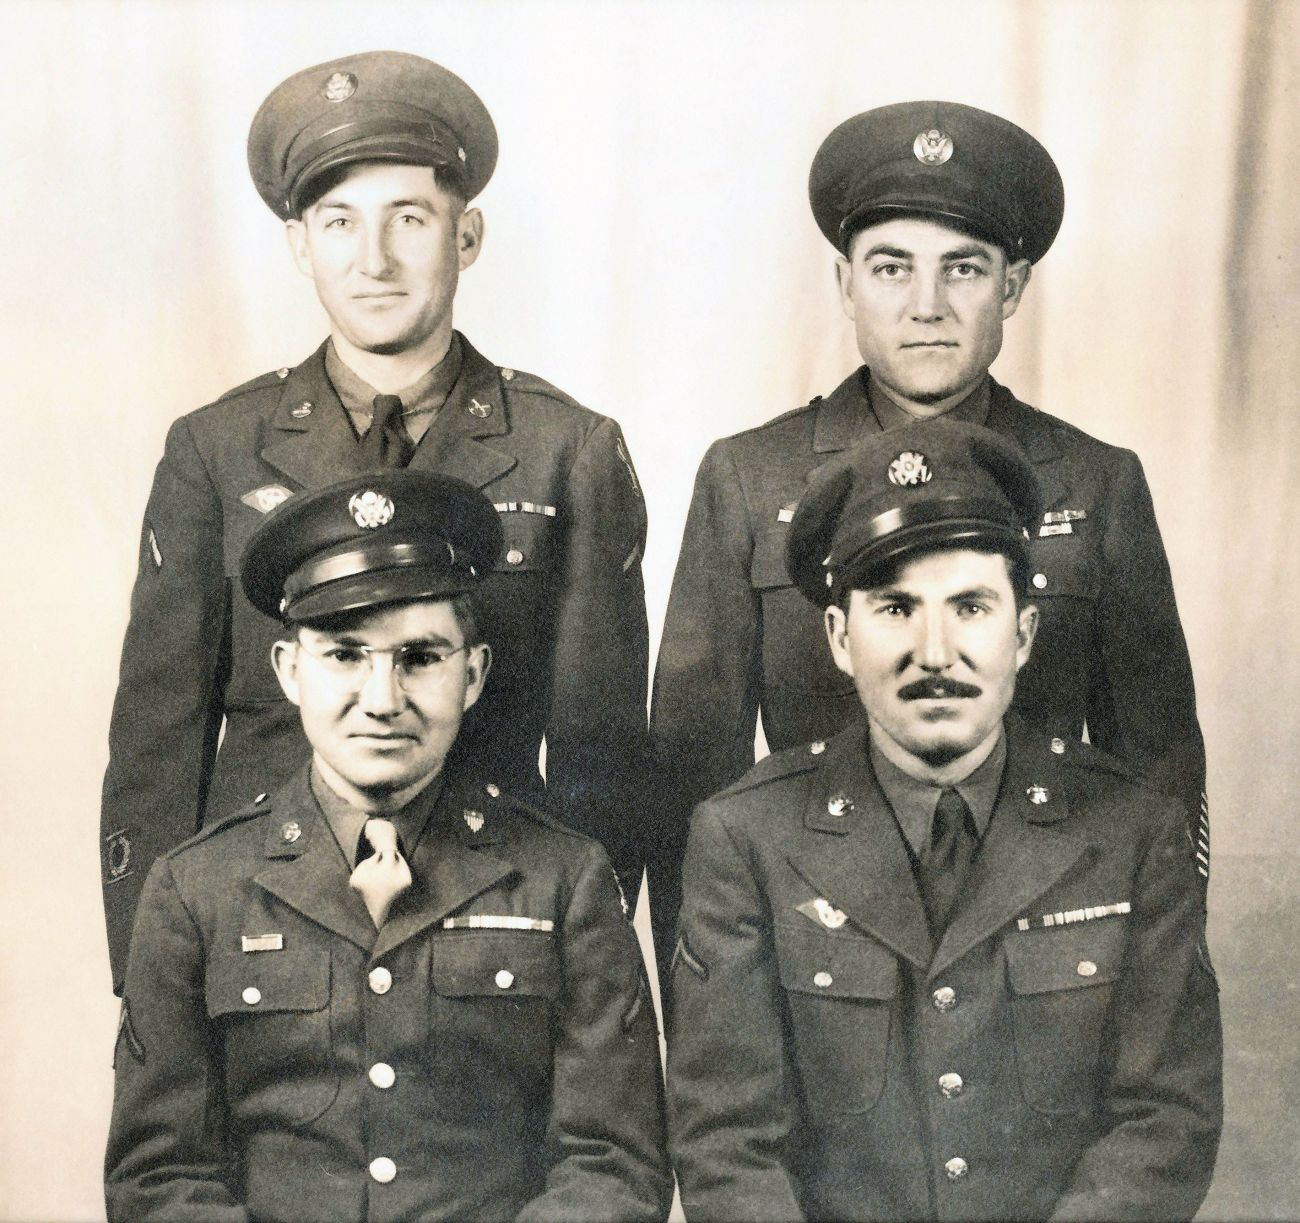 four-brothers-serve-honorably_benjamin_tony_simon_edward_t